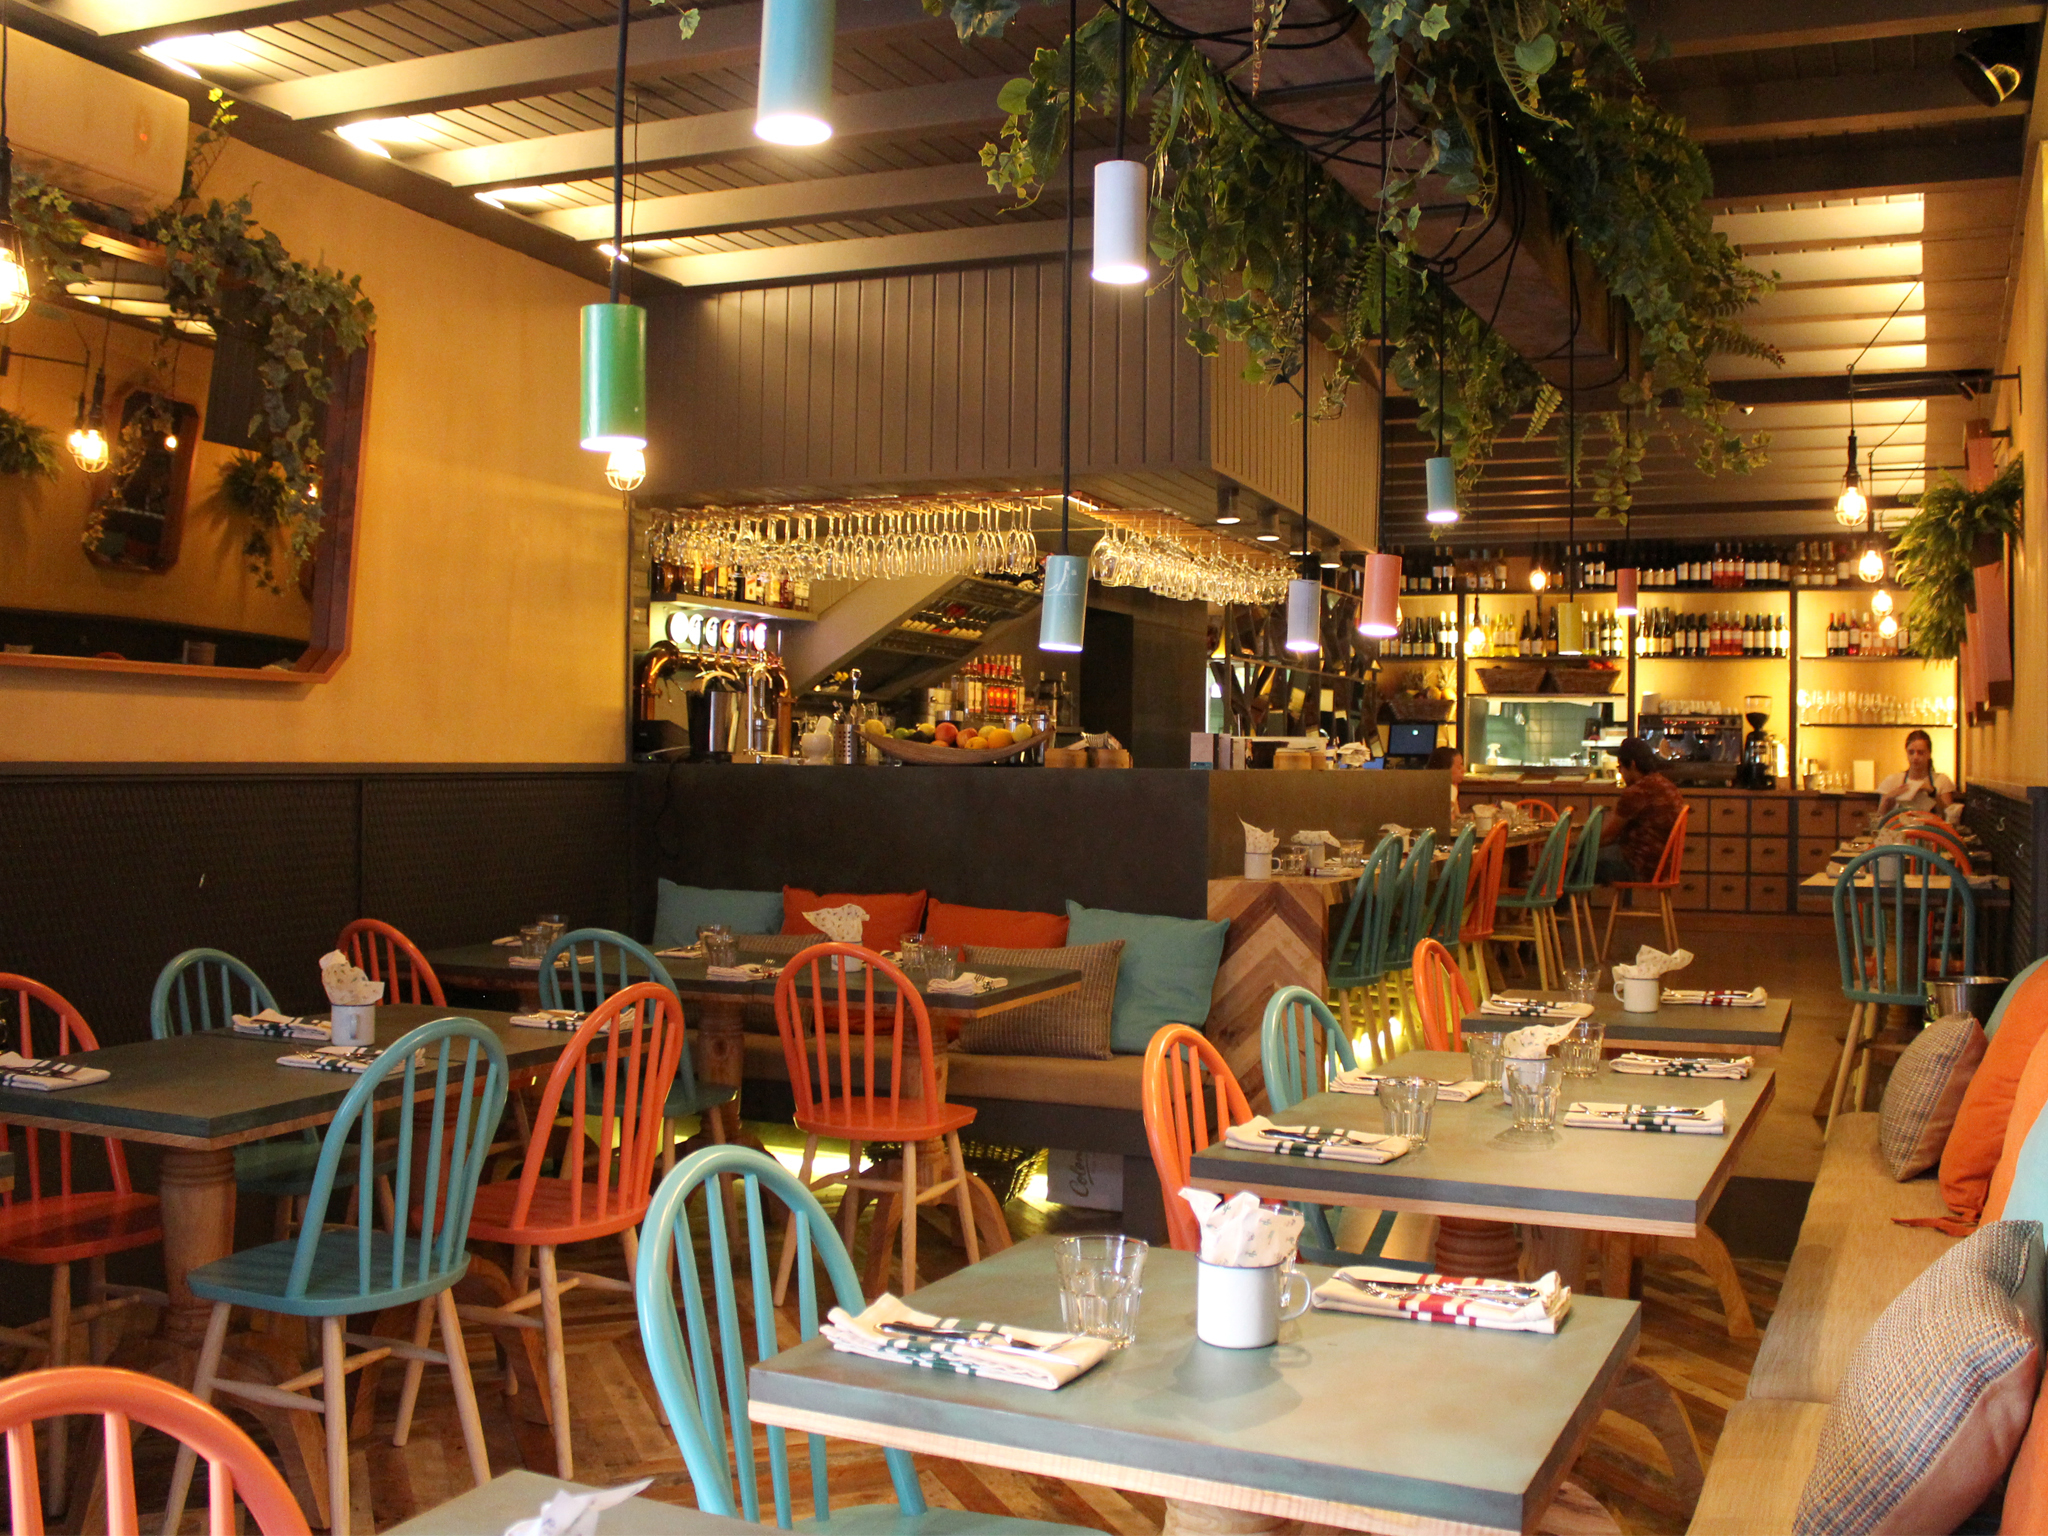 Panca – Cevicheria & Pisco Bar